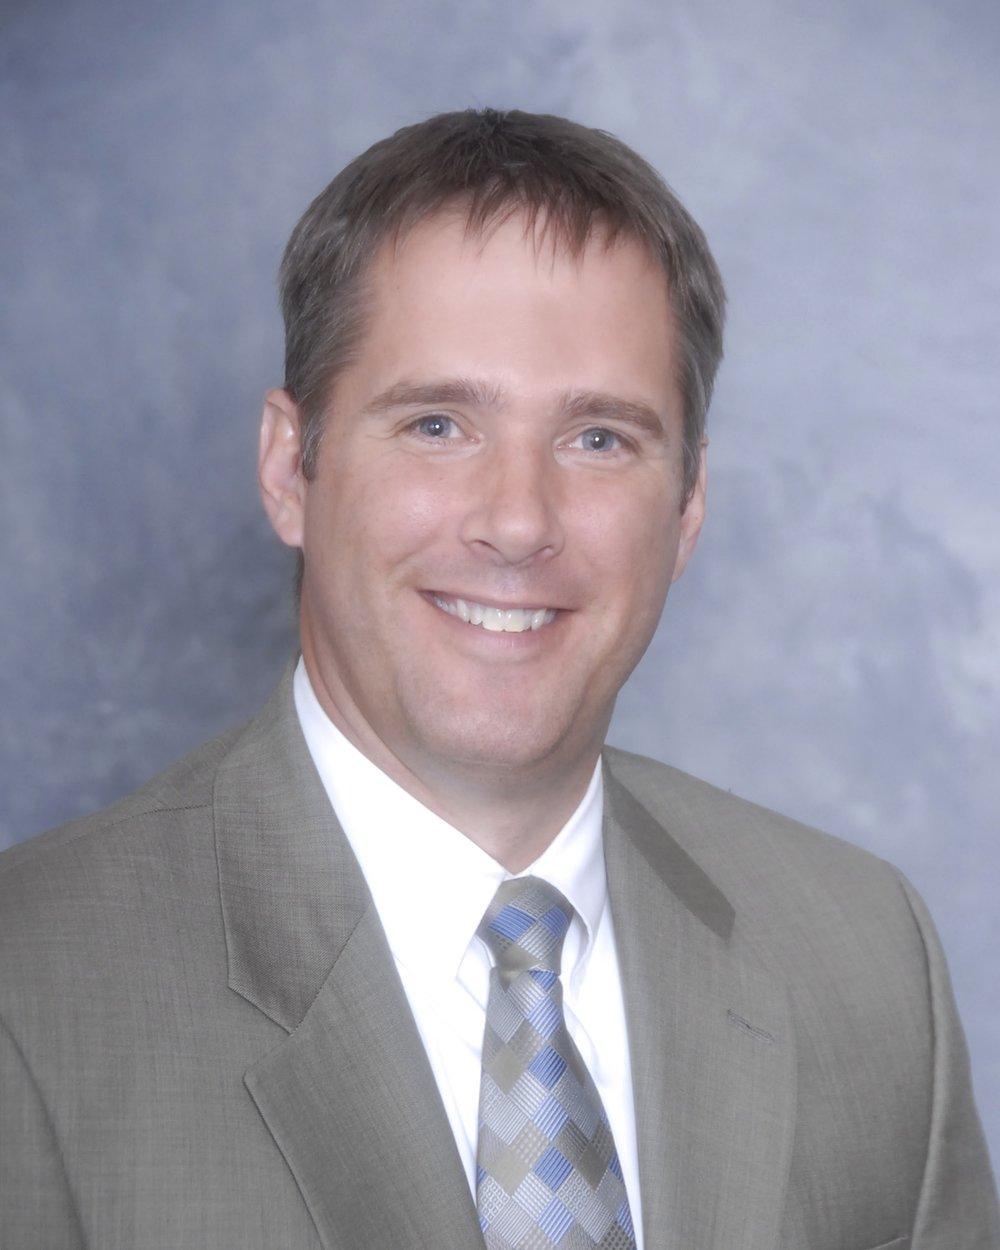 David Brown, Executive Vice-President of idegy, inc Photo via David Brown